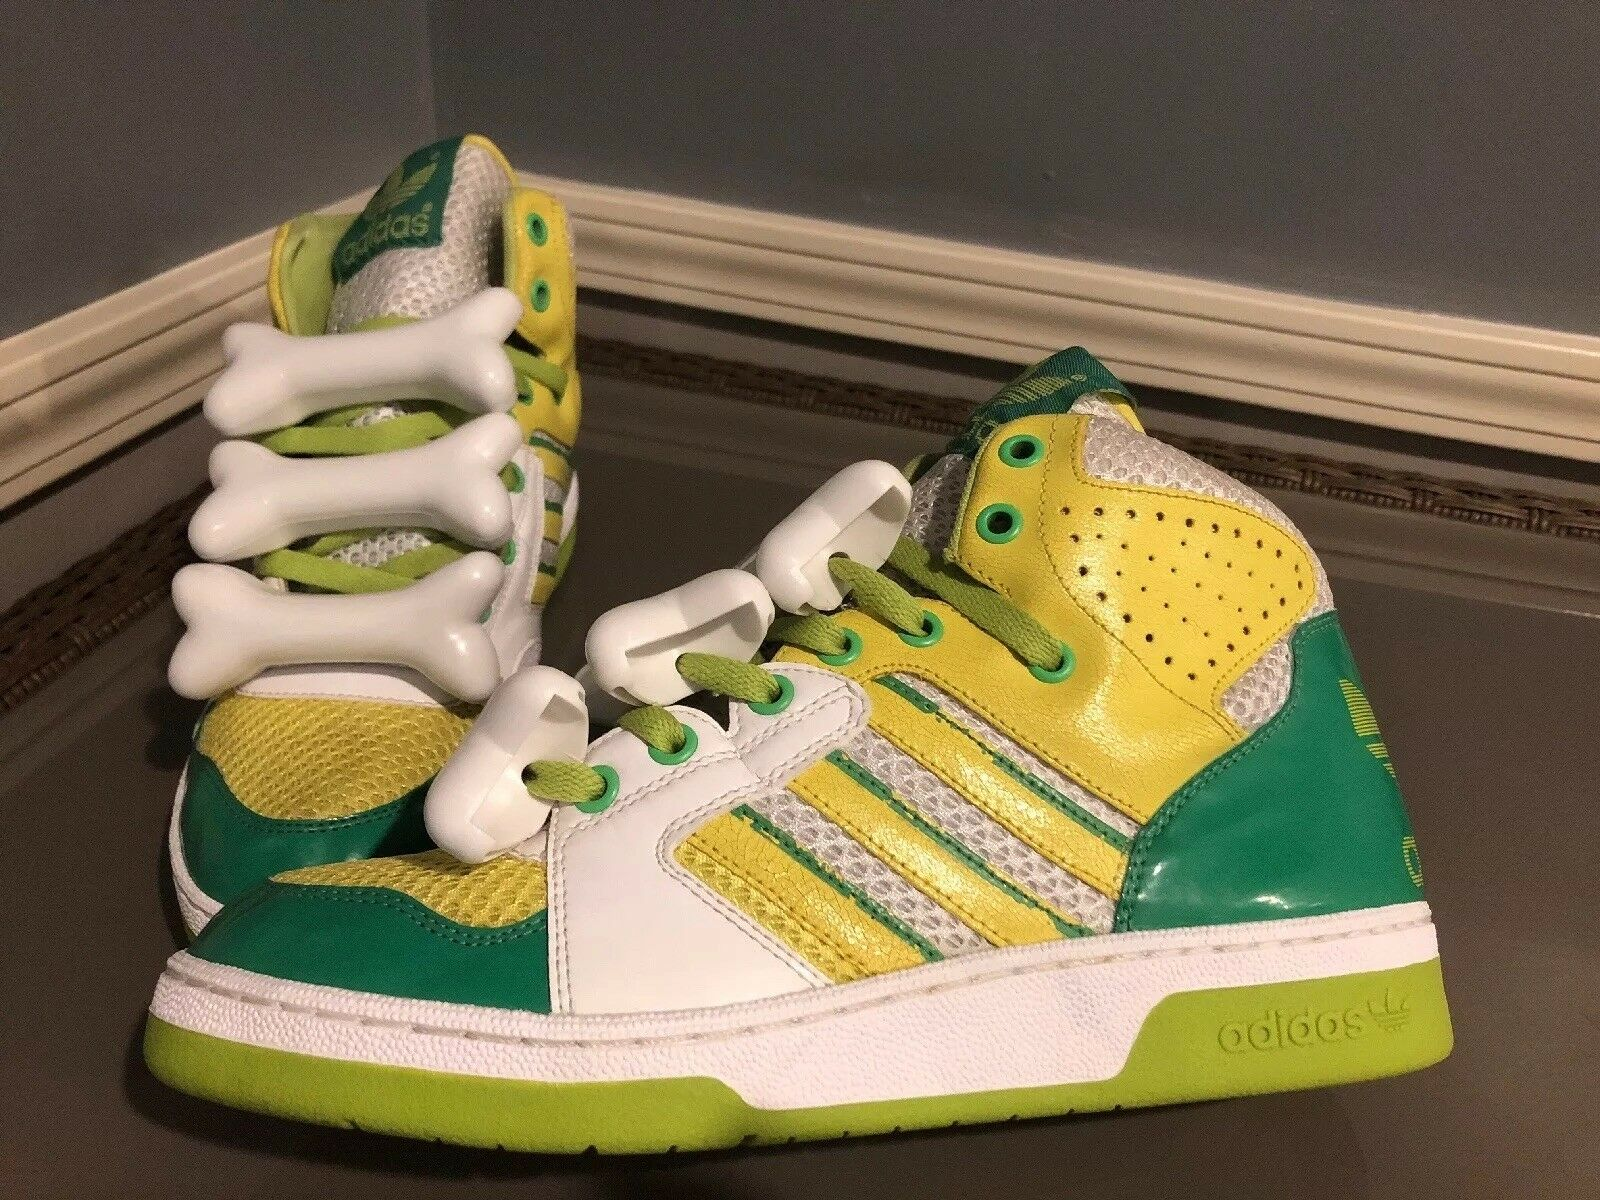 Adidas, jeremy scott, knochen tribut, größe 10, selten.